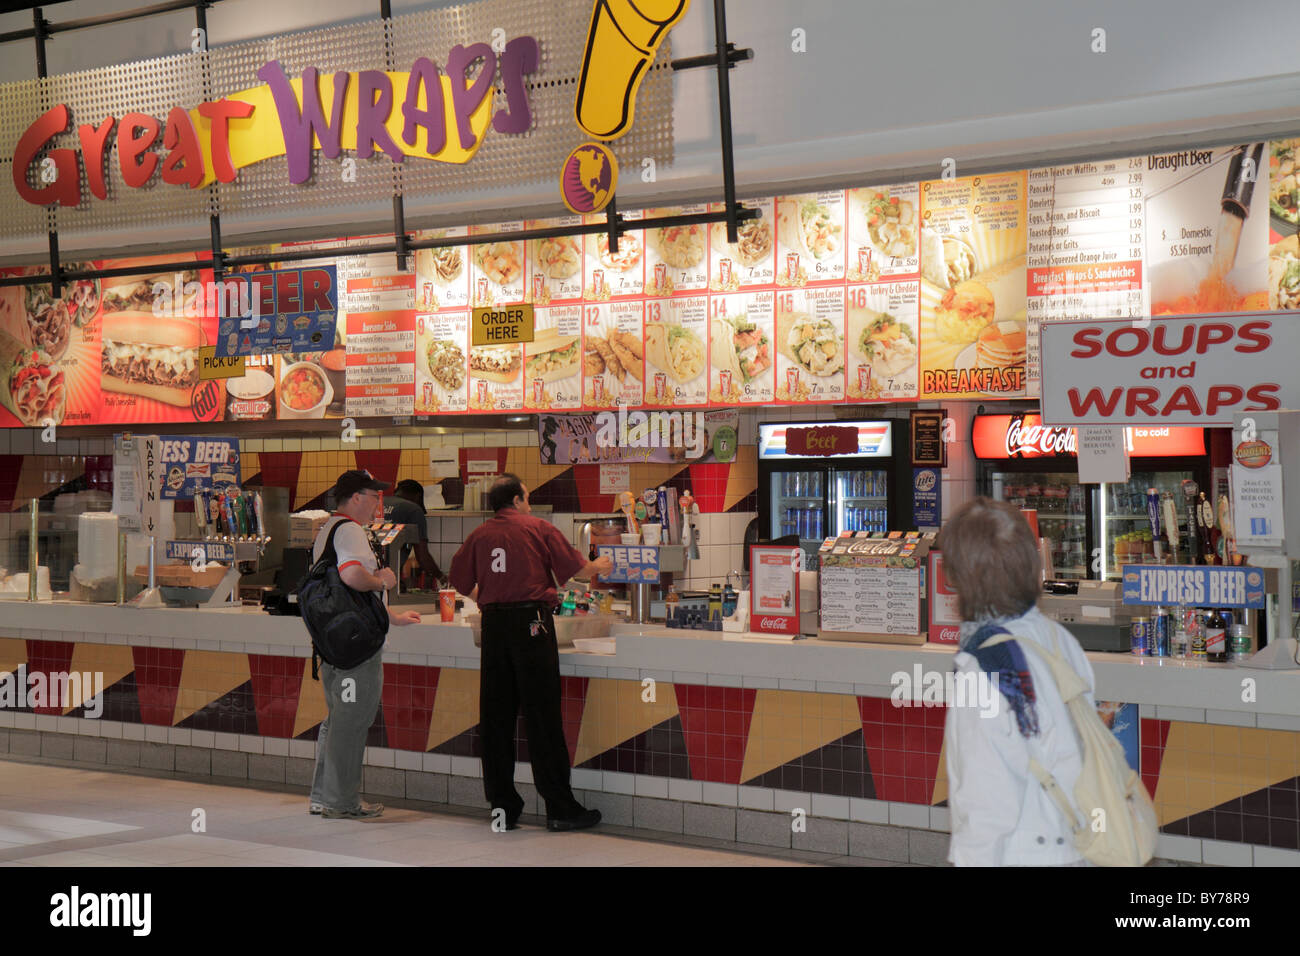 Cnn Food Court Restaurants